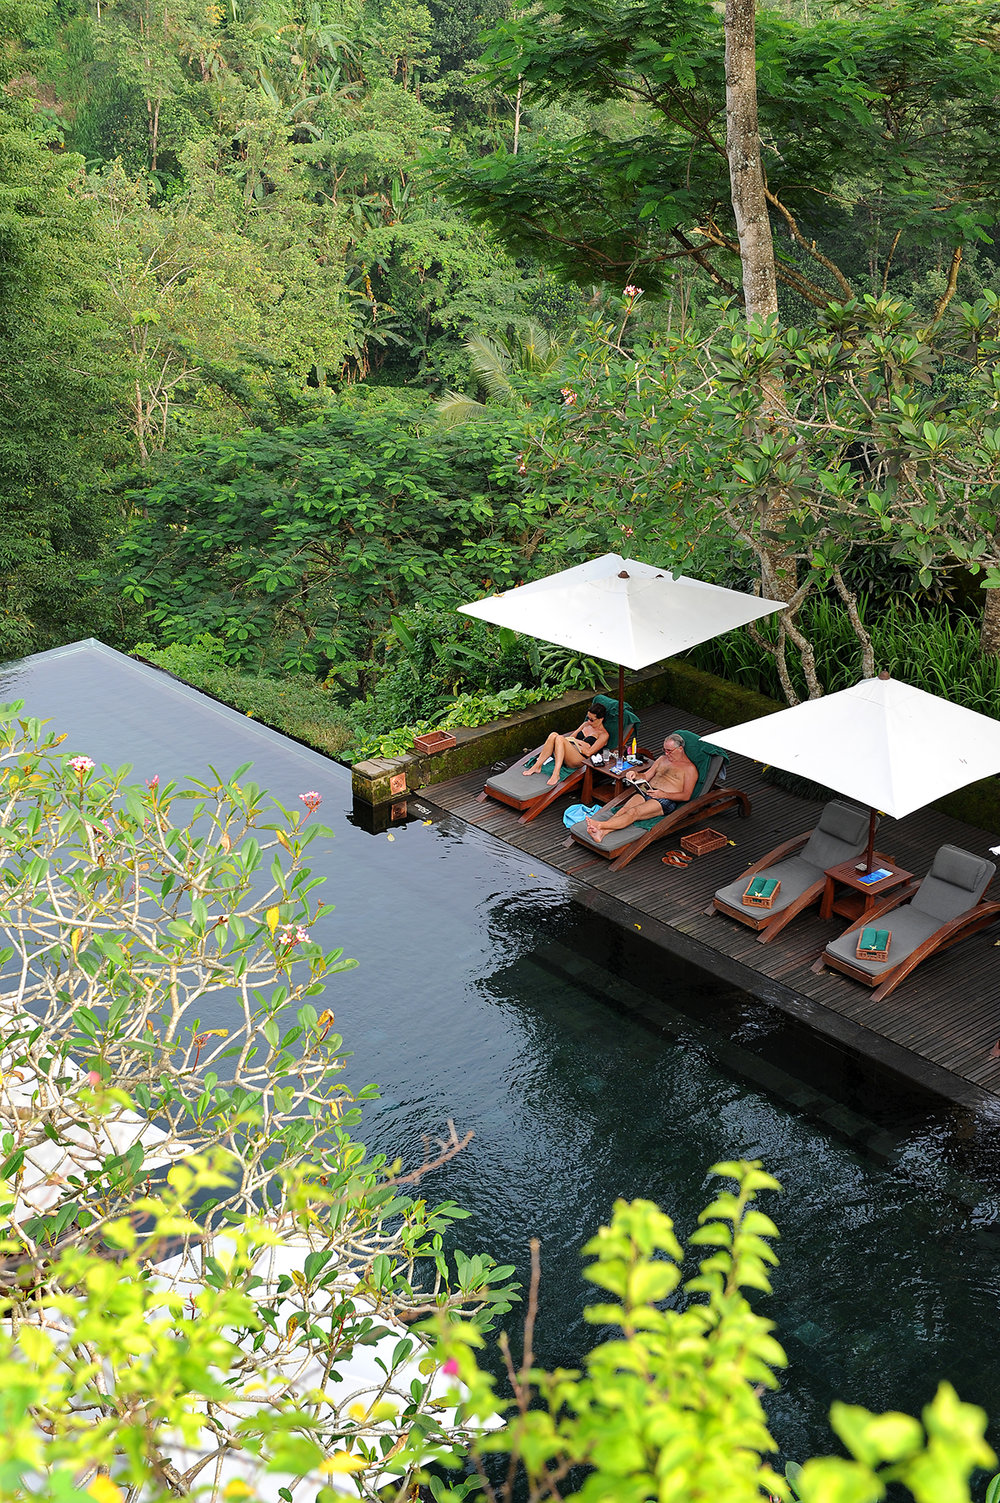 matka, matkablogi, matkailu, Bali, Ubud, hotelli, uima-allas, Maya Ubud, tropiikki